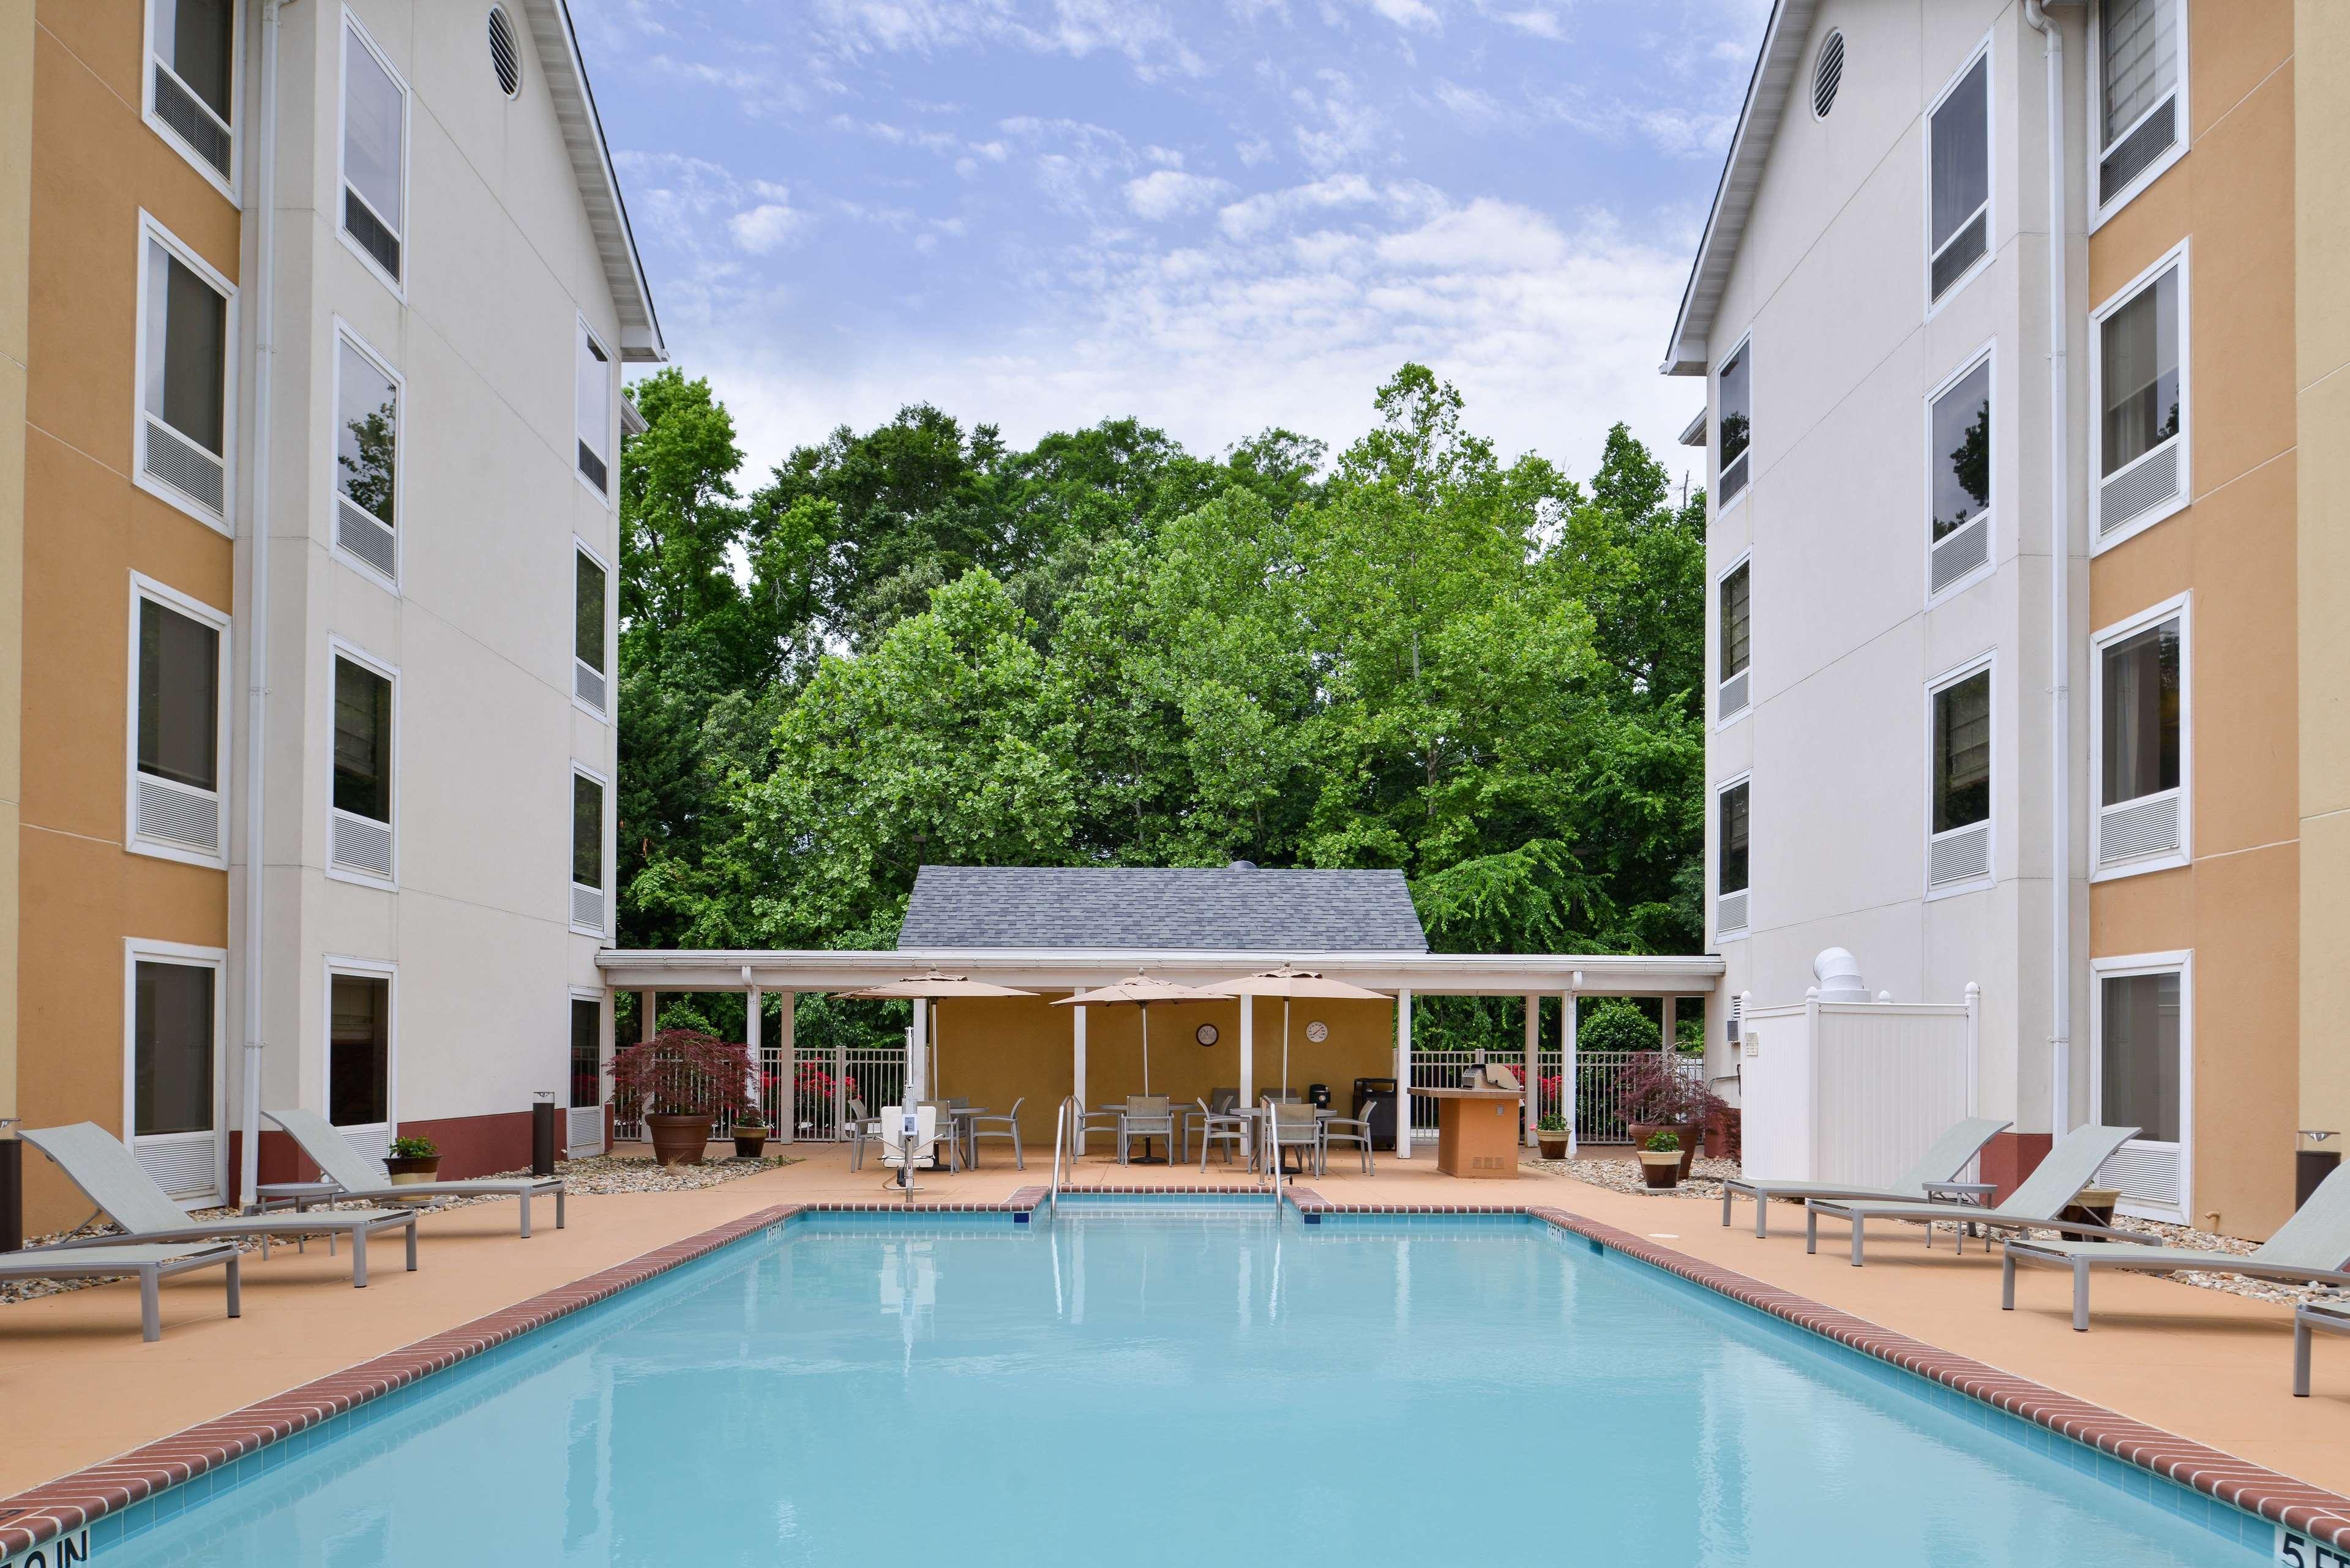 Hampton Inn & Suites Newport News (Oyster Point) image 8